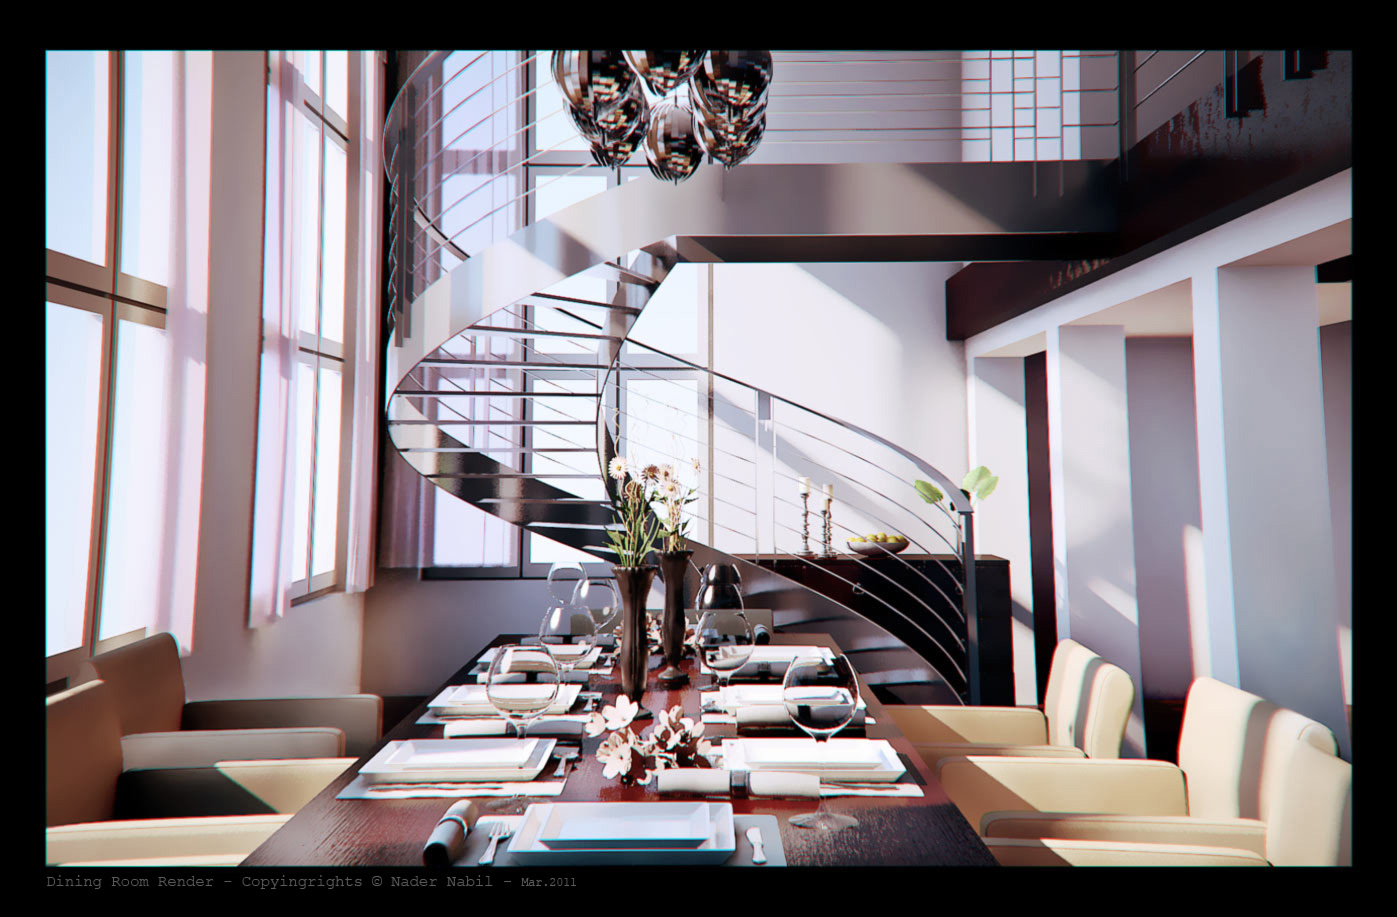 Dining Room render by naderdes